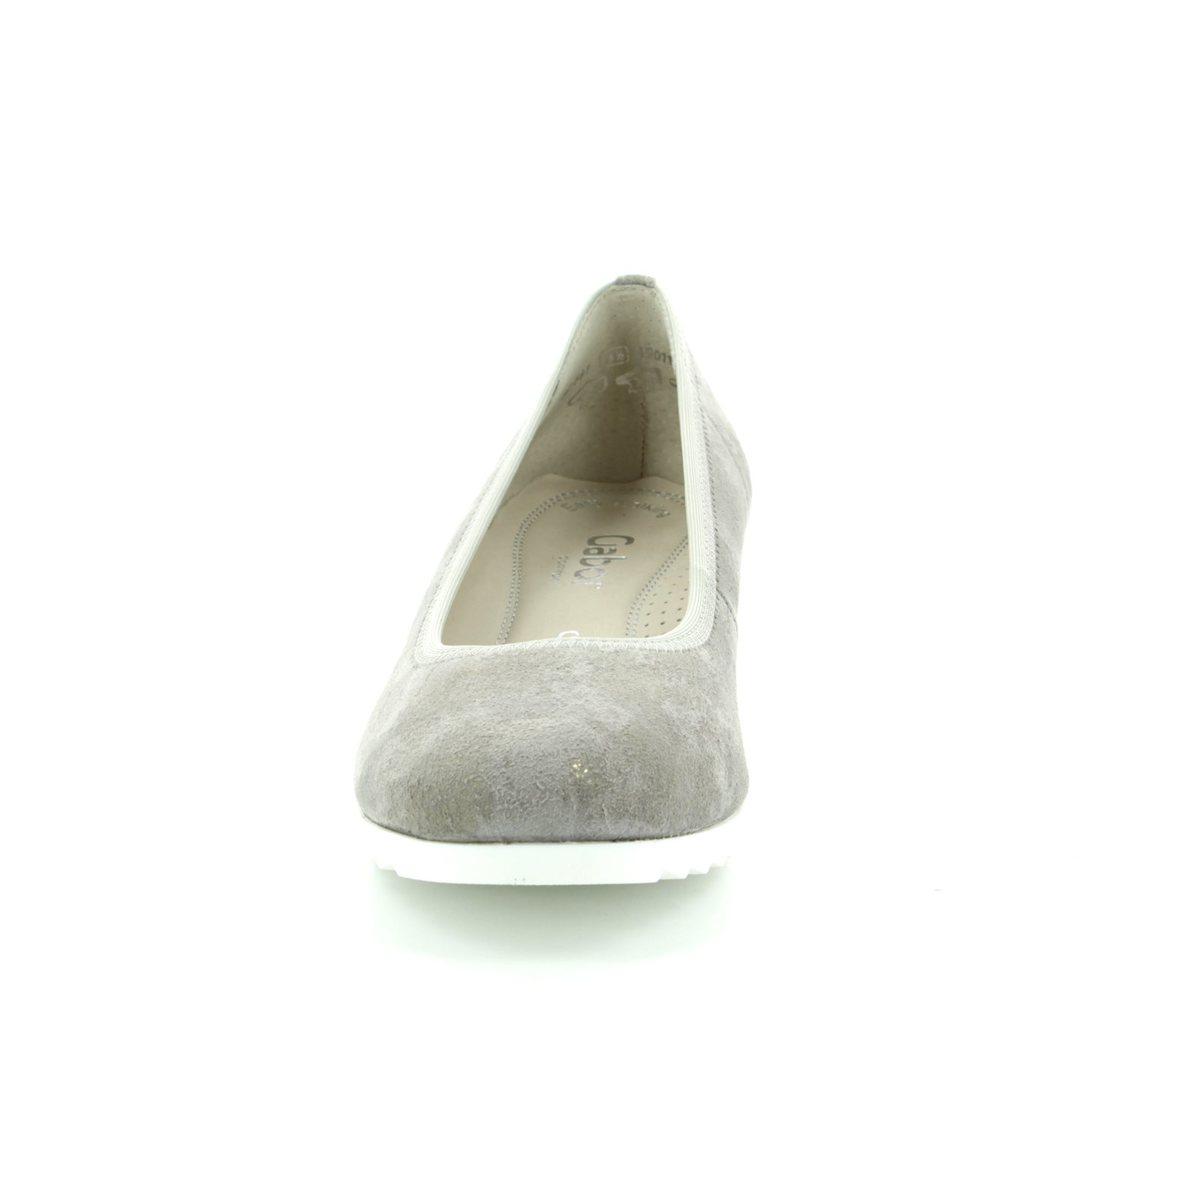 3a59492f4 Gabor Wedge Shoes - Metallic - 82.641.93 EPWORTH